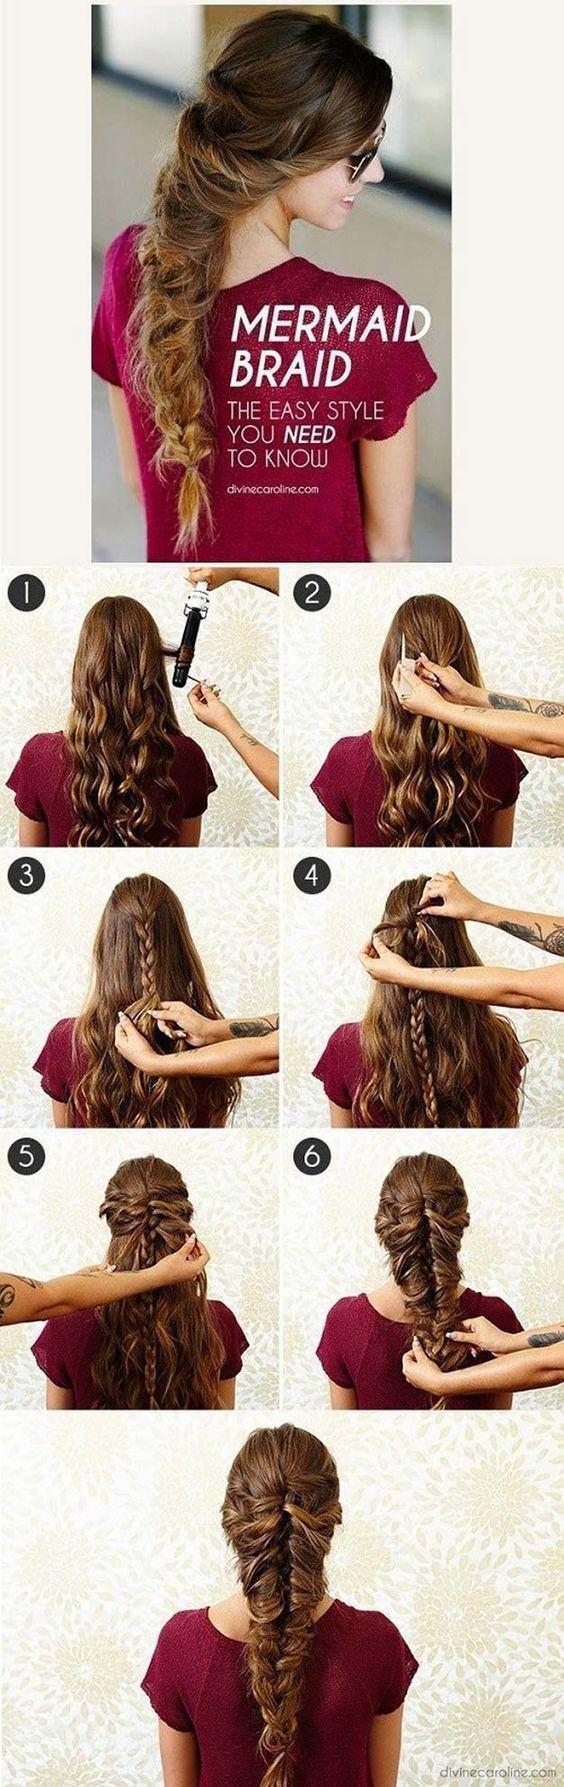 Best Hair Braiding Tutorials  Mermaid Braid  Easy Step by Step